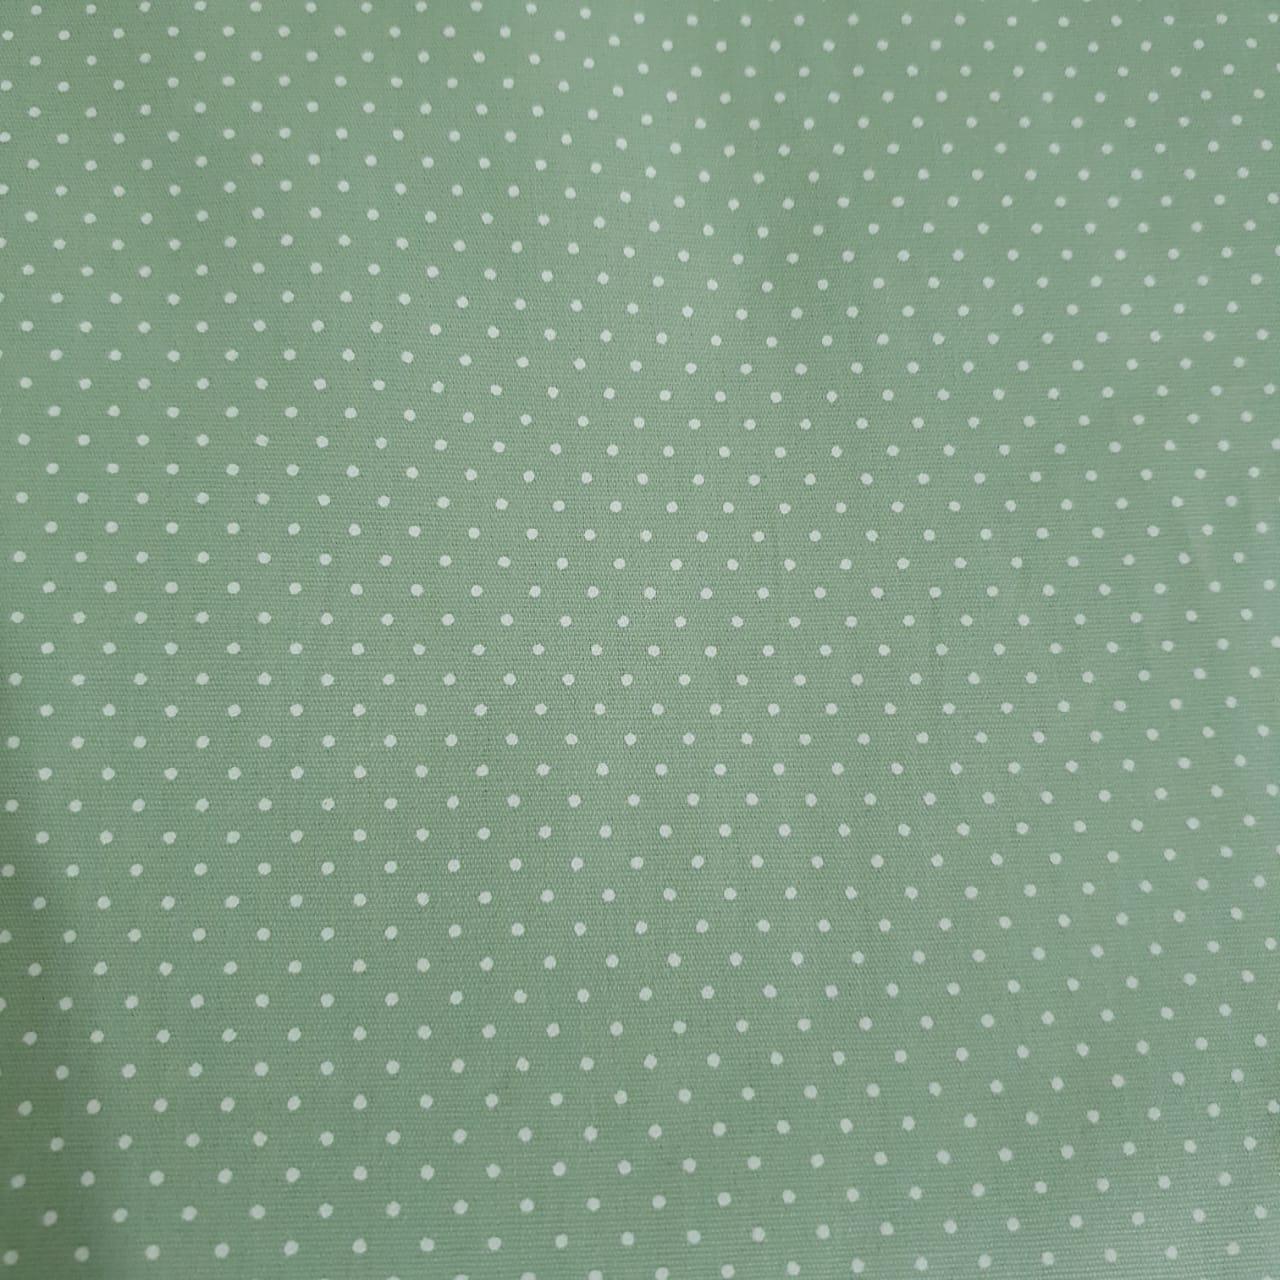 Tecido Tricoline Poá Verde claro OF